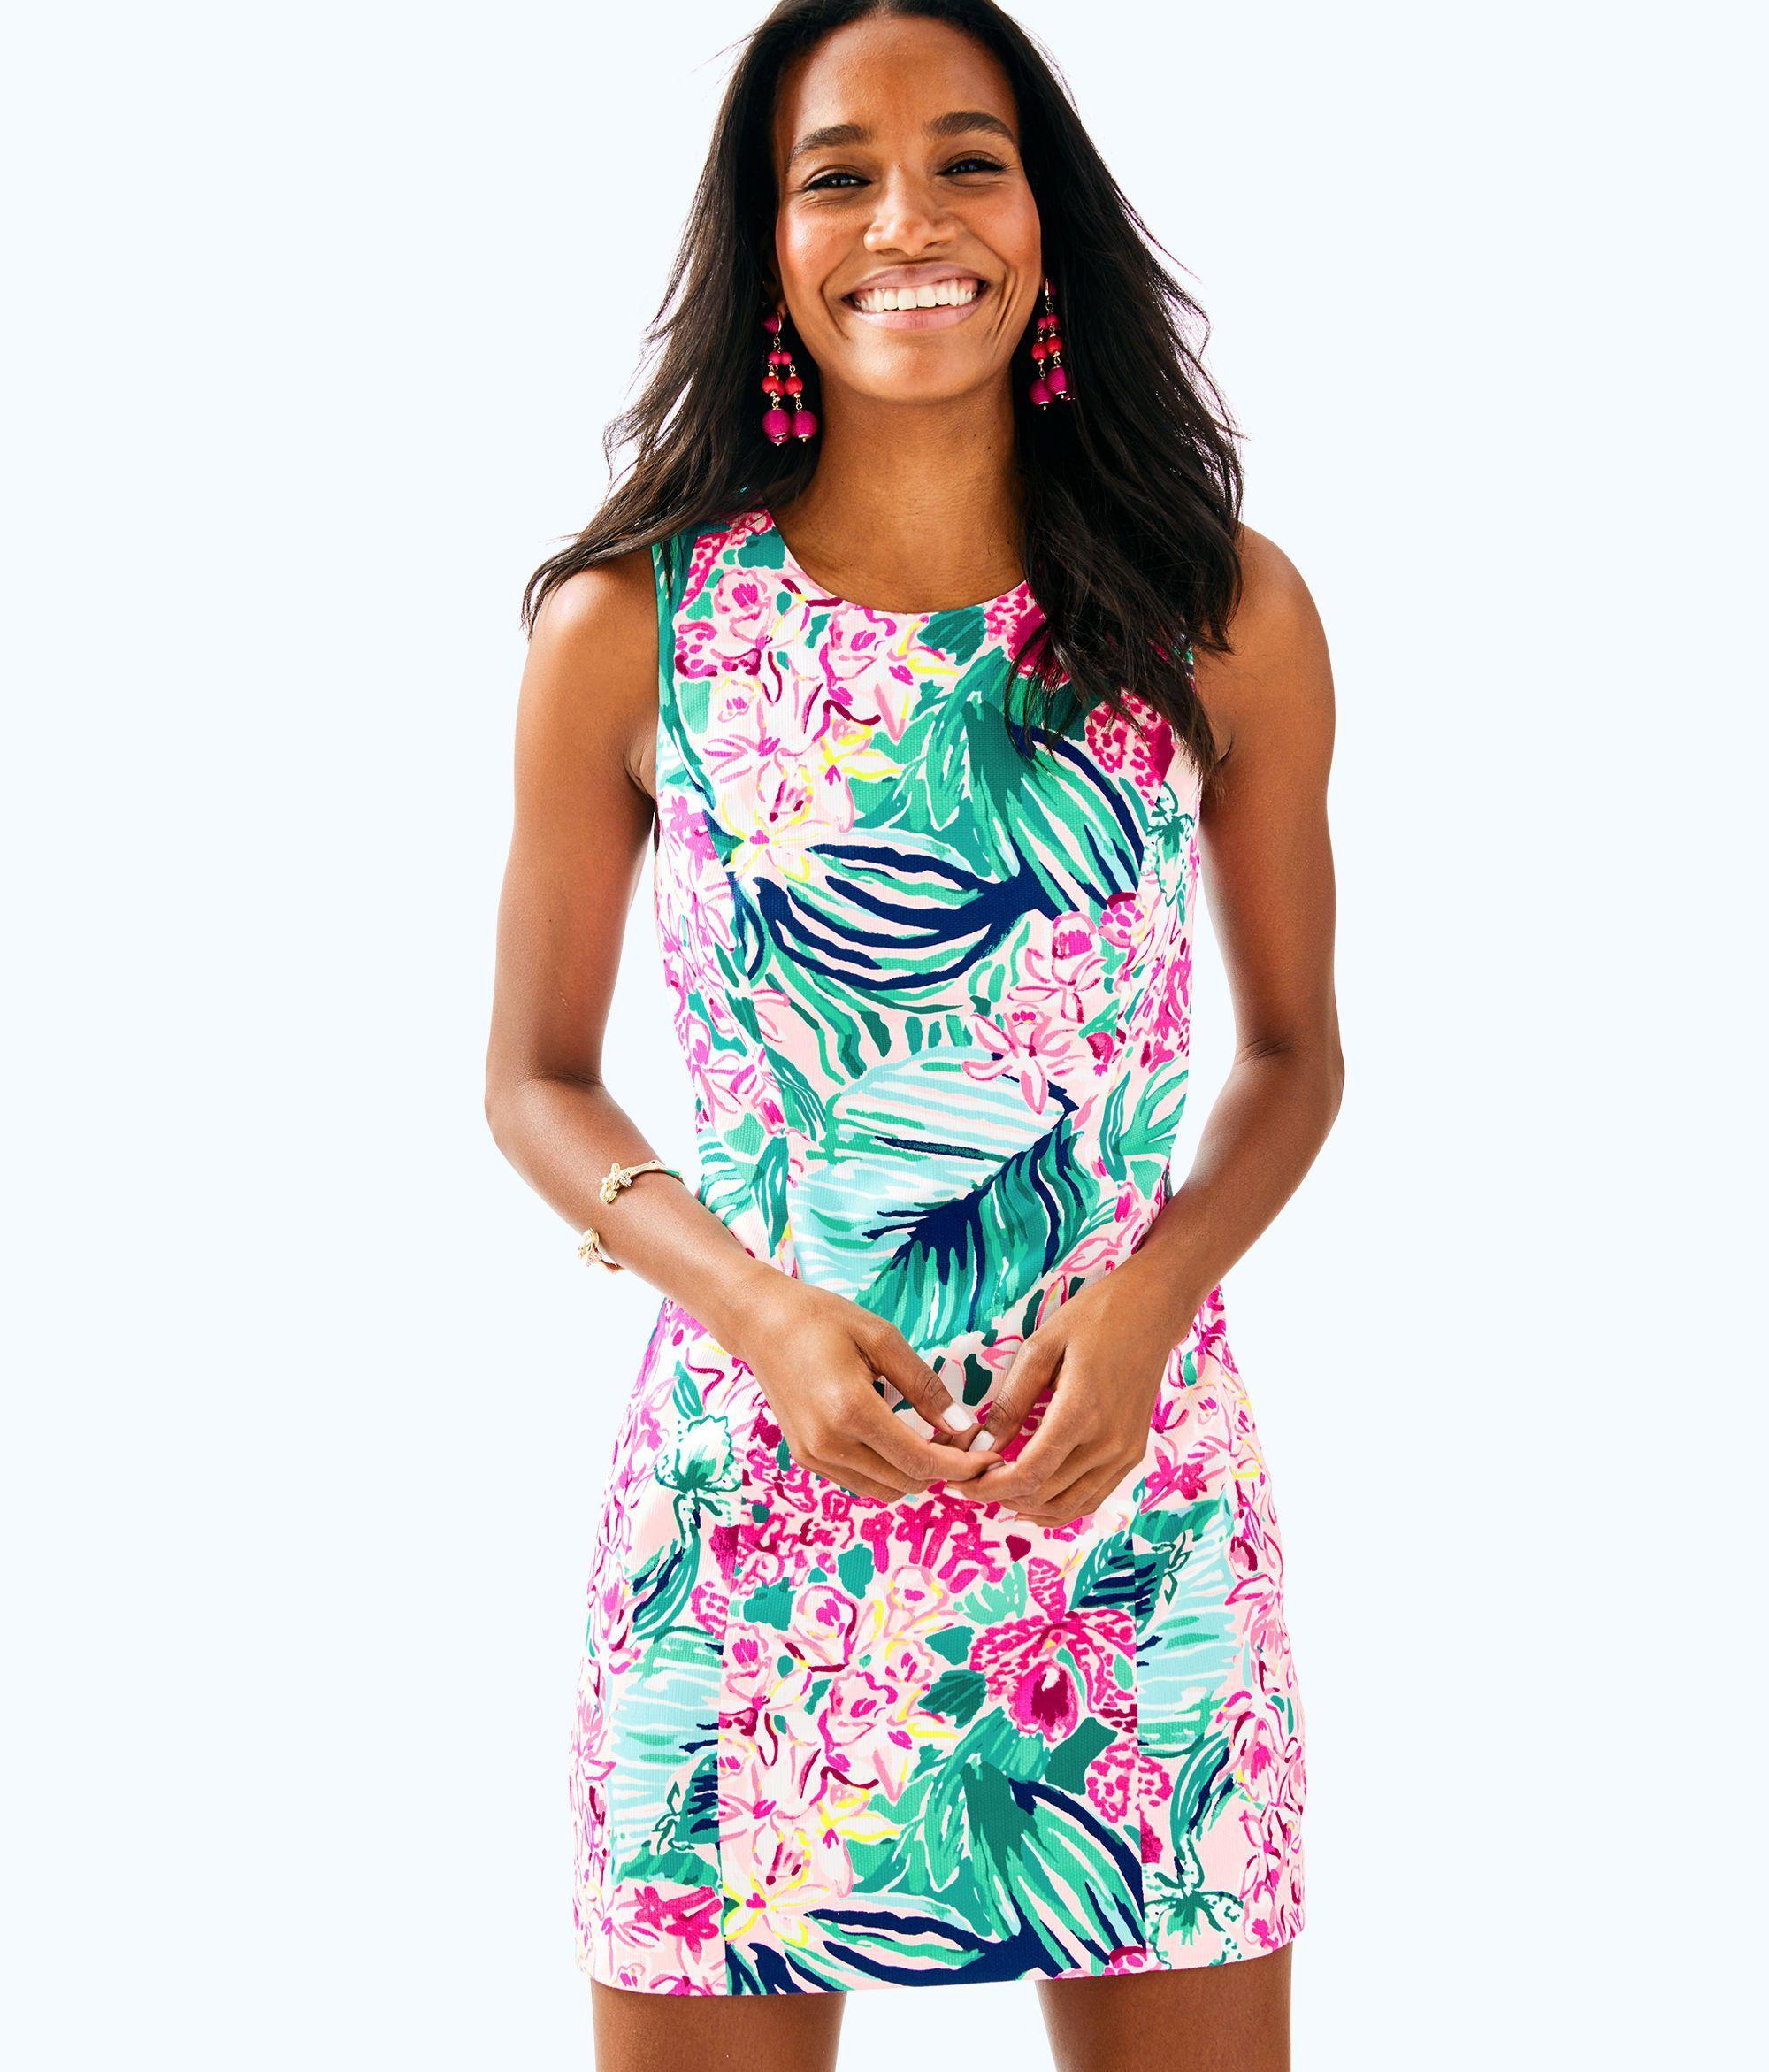 d23414b1a5f5 Lilly Pulitzer Mila Stretch Shift Dress - Multi Via Flora